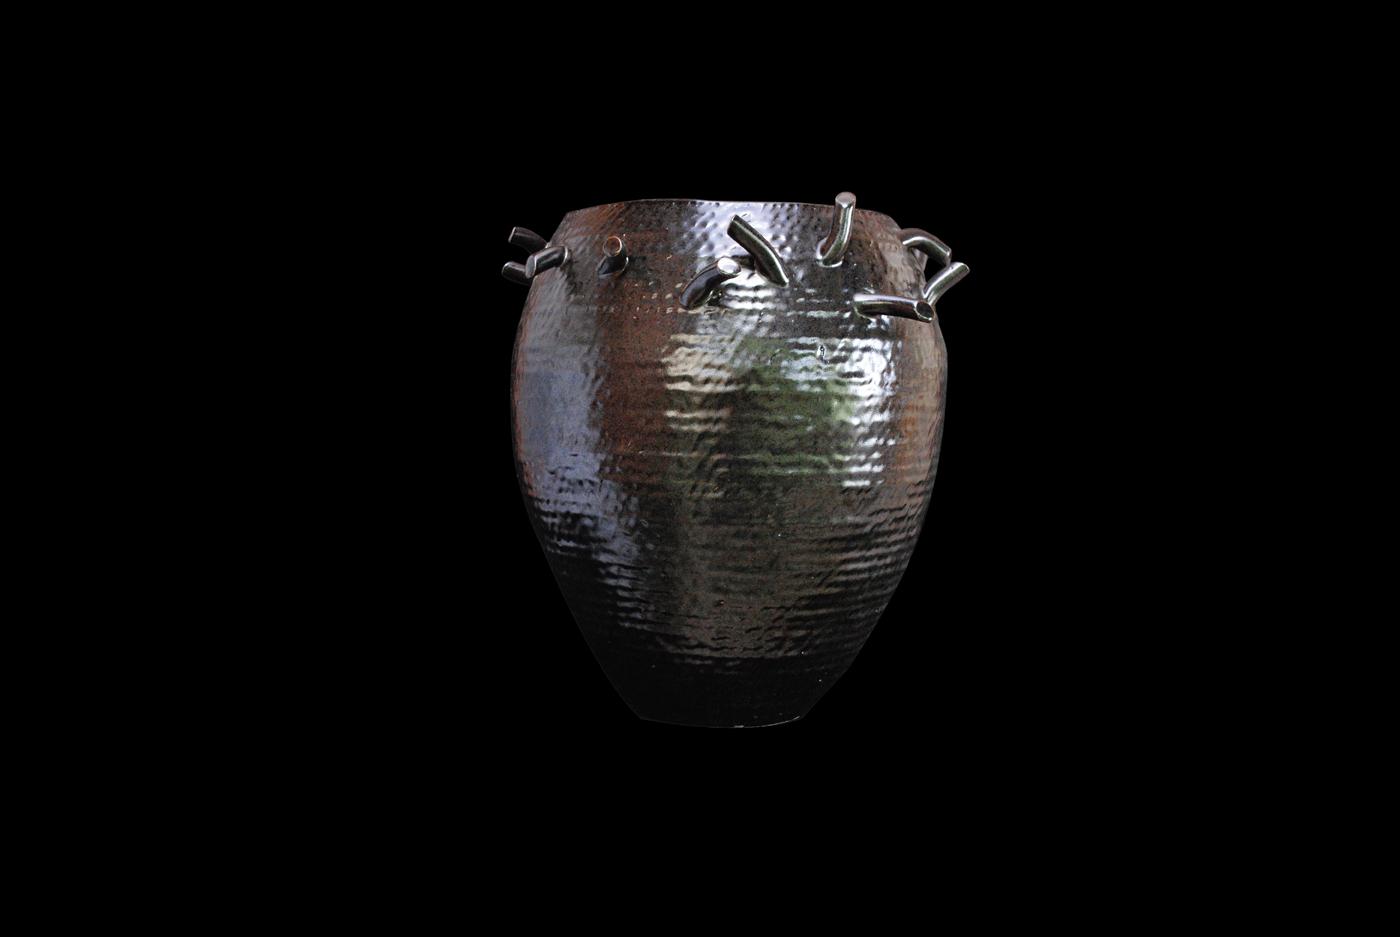 MV-07